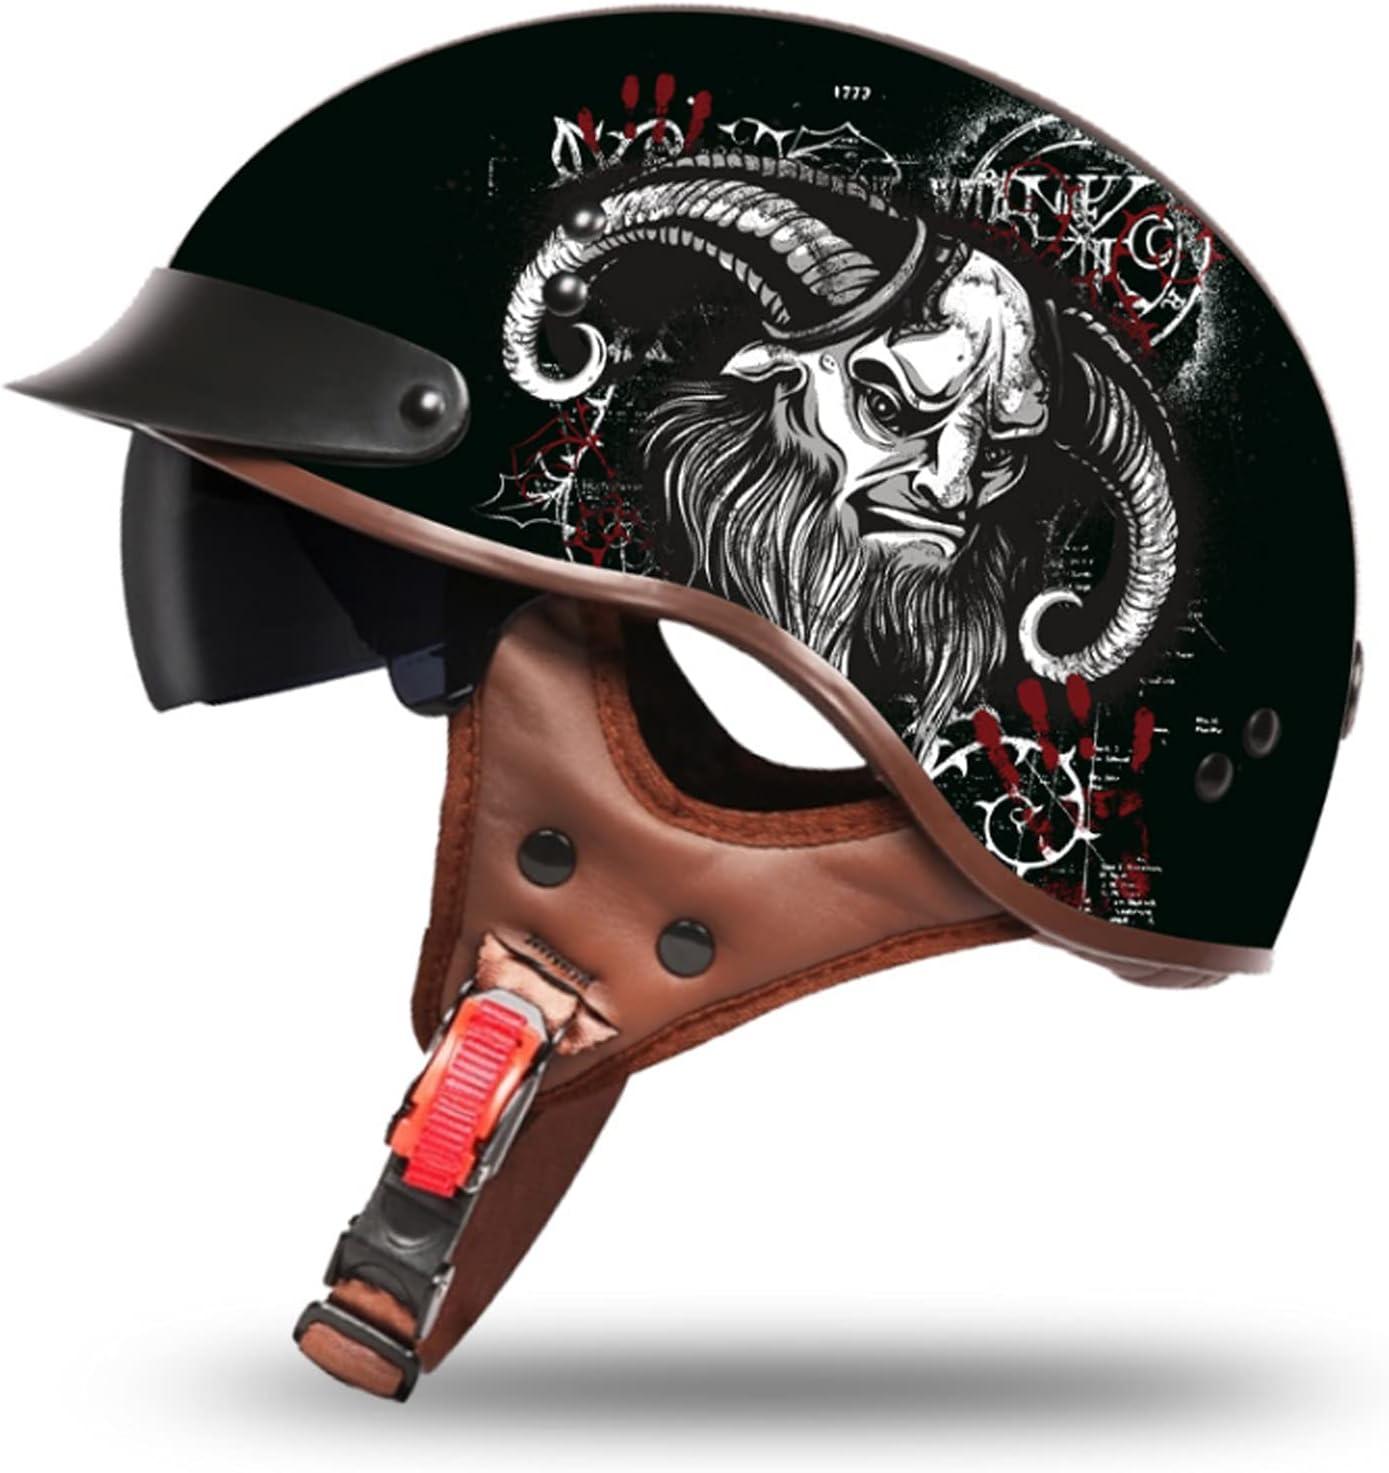 Summer Retro Austin Mall Popular shop is the lowest price challenge Half Helmet Vintage Motorcycle Helmets Open-Face Me